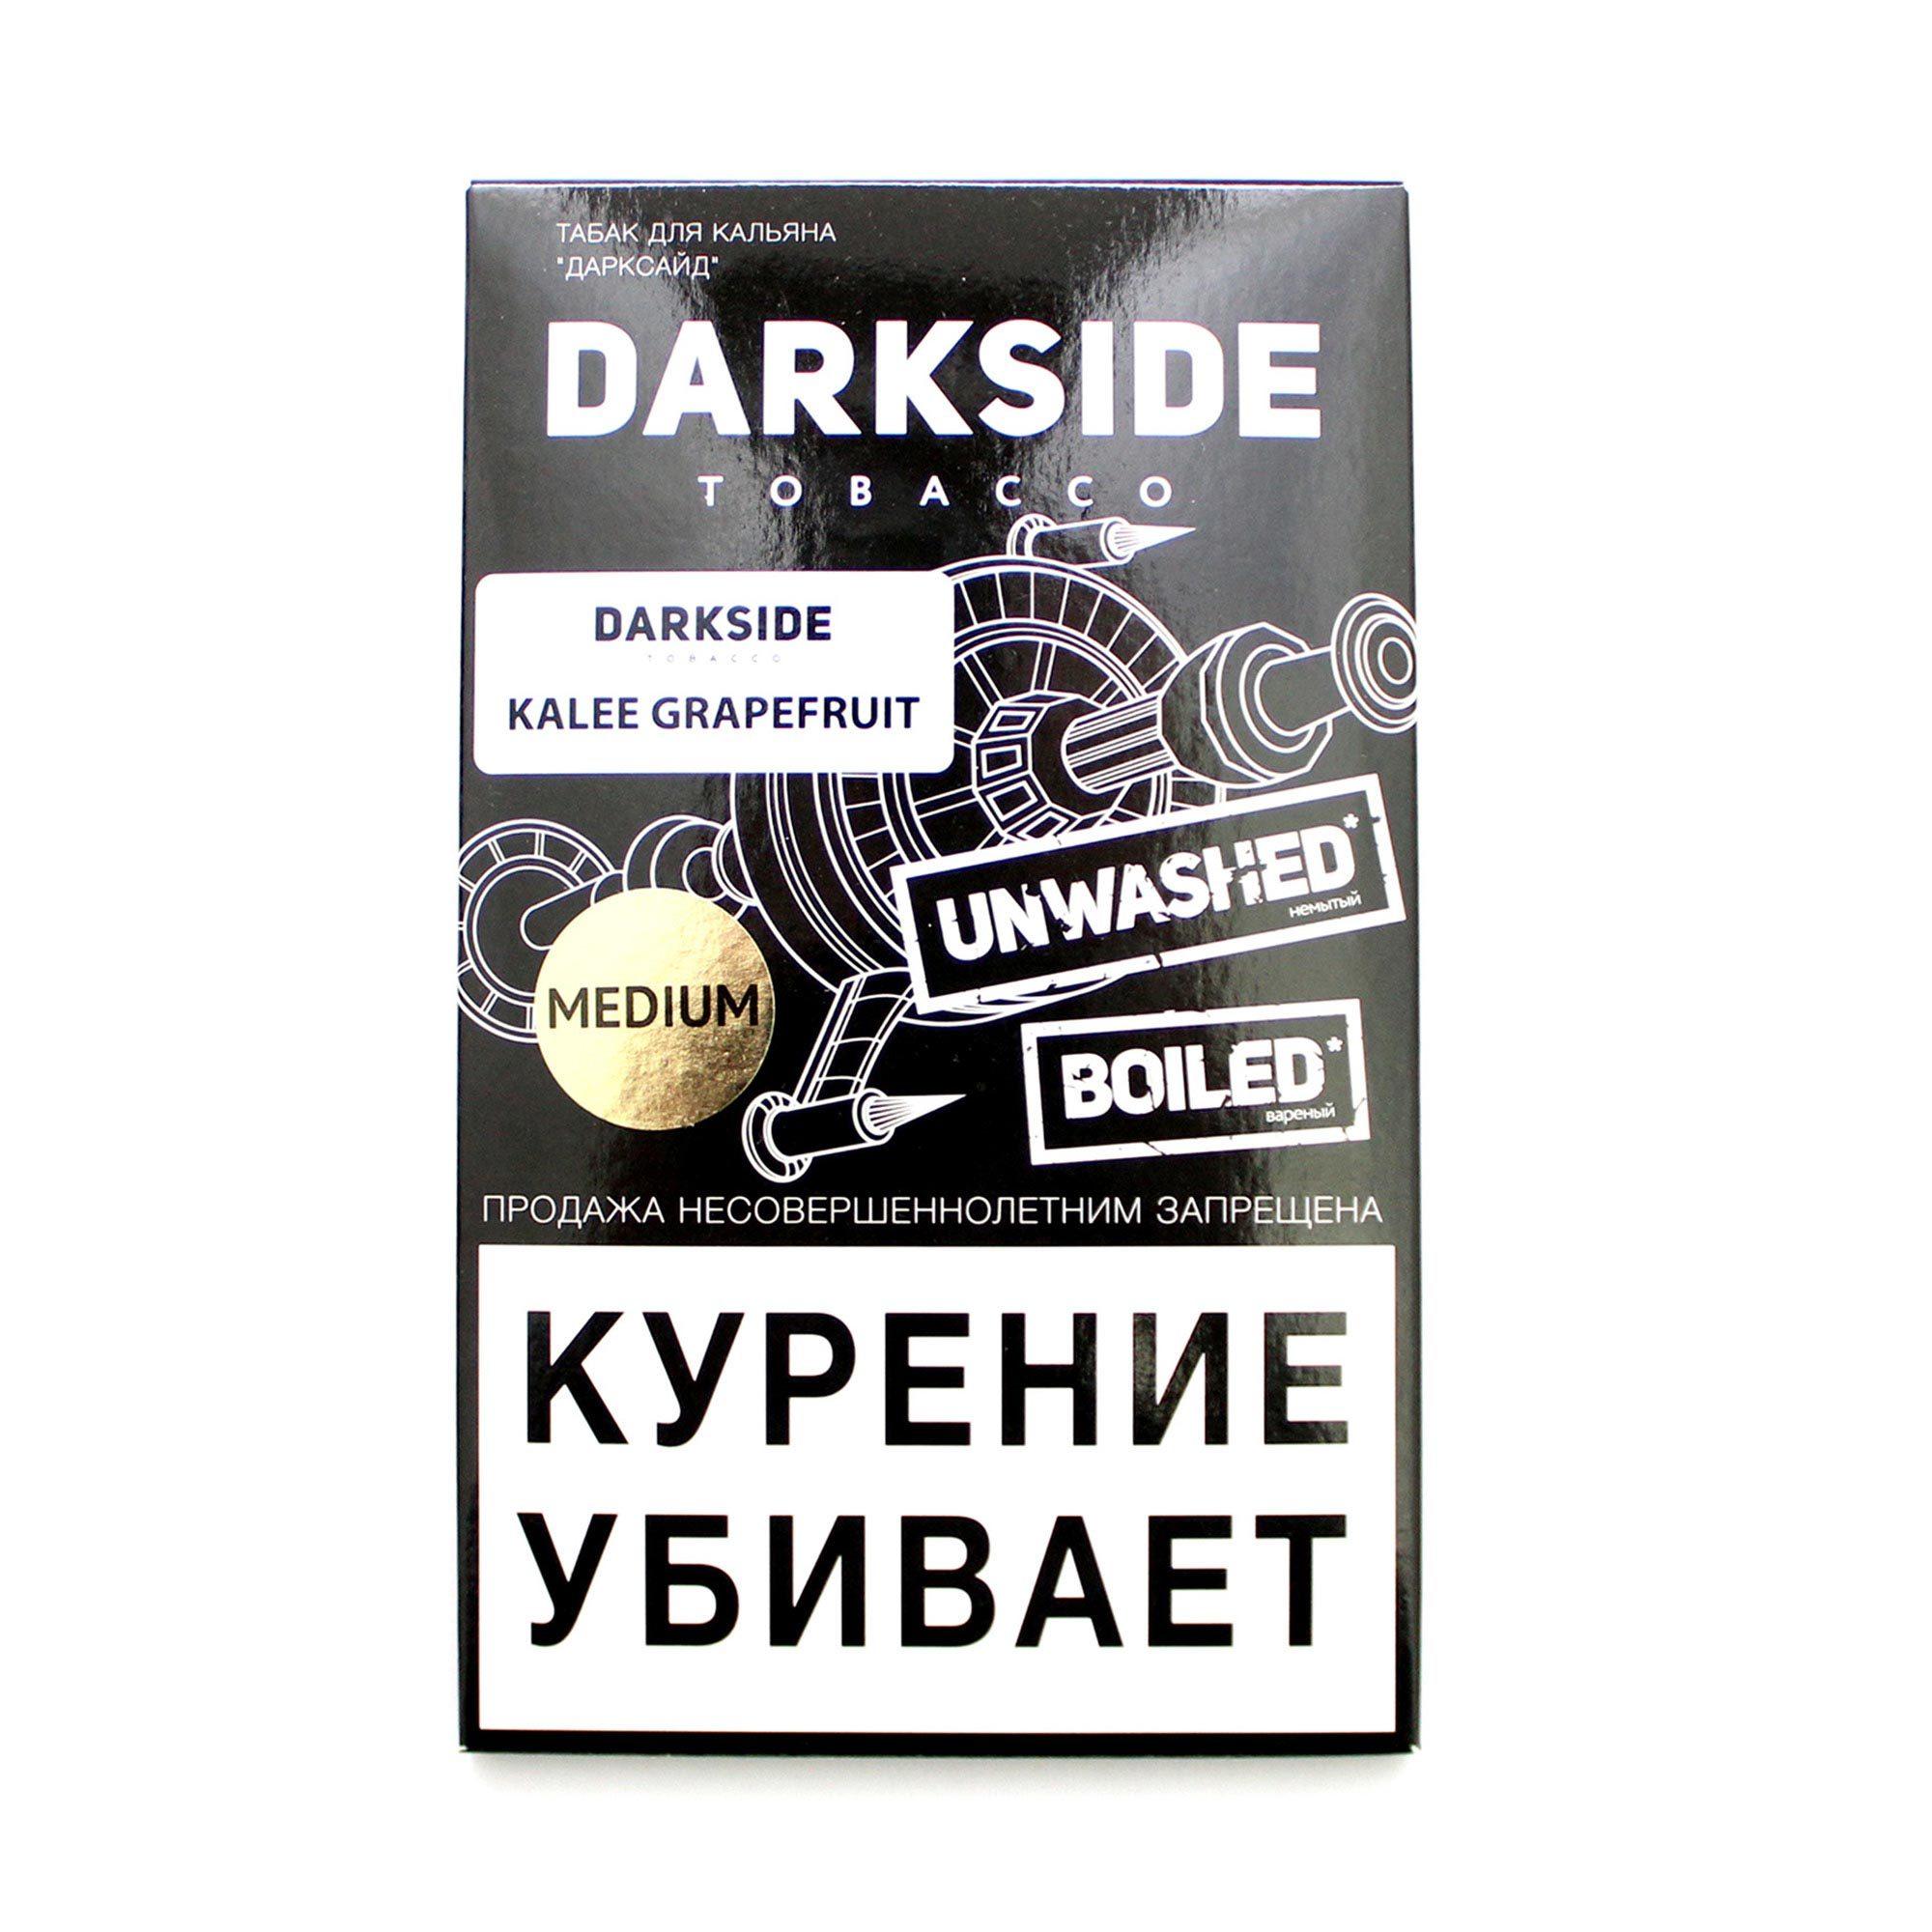 Табак для кальяна Dark Side Medium 100 гр. Kalee Grapefruit